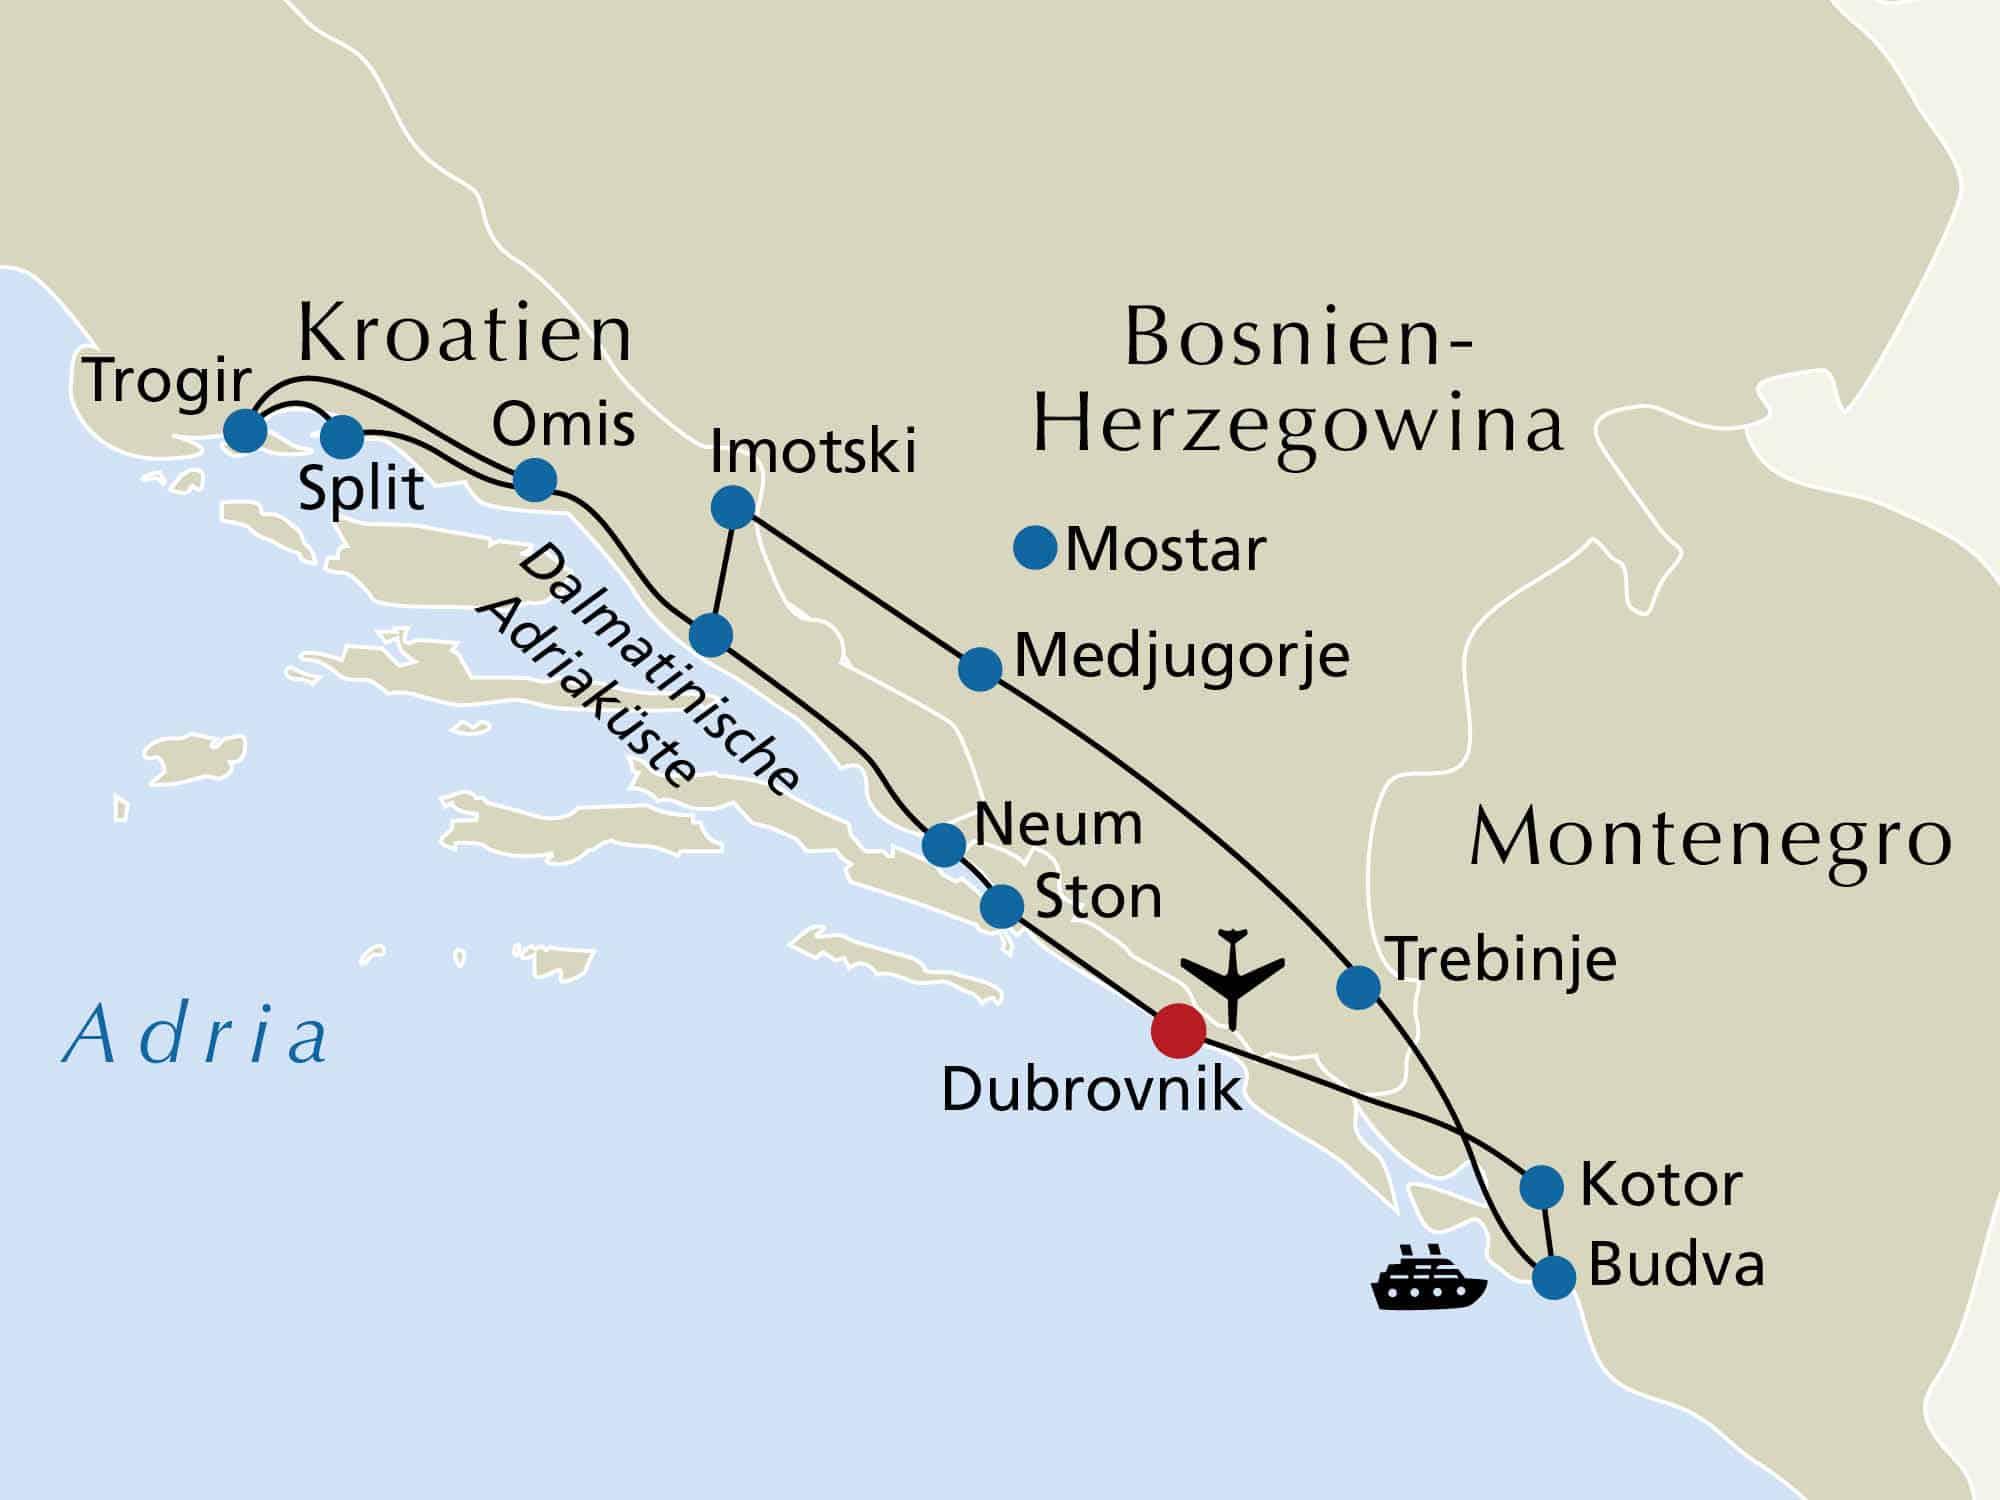 8 Tage 4 -Sterne-Studienreise Kroatien & Montenegro 199,-€ p.P.